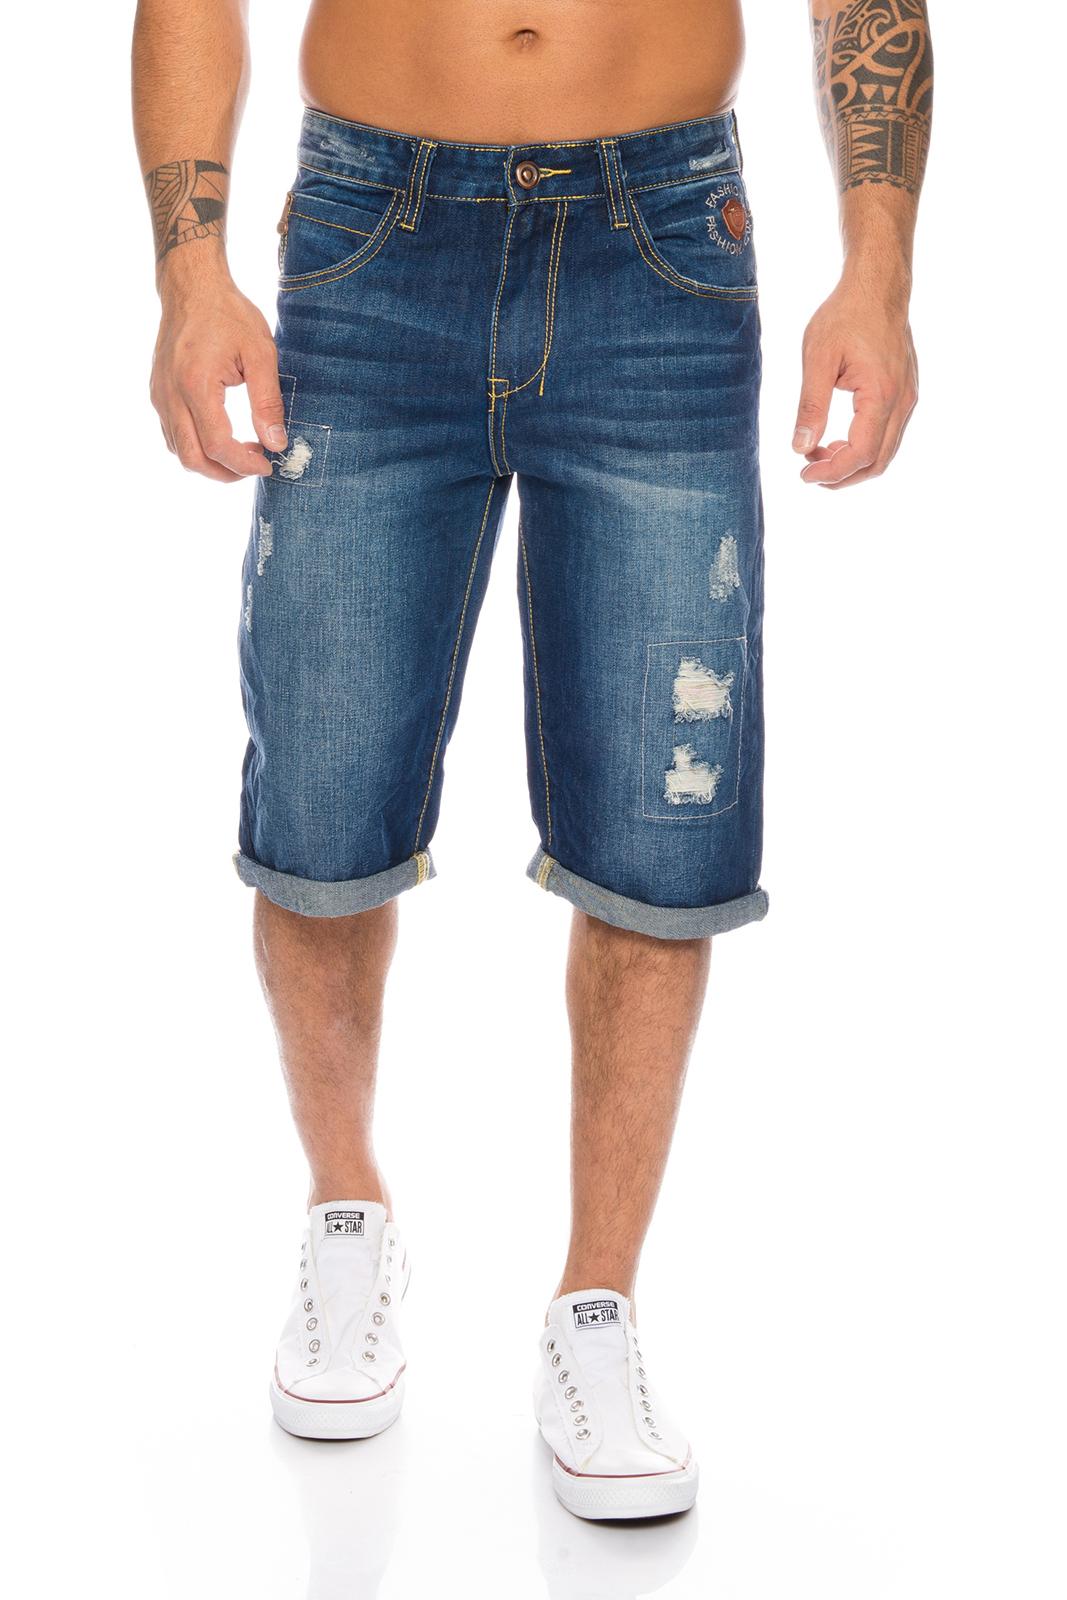 herren jeans short sommer bermuda kurze hose shorts h 073 neu w28 w38. Black Bedroom Furniture Sets. Home Design Ideas